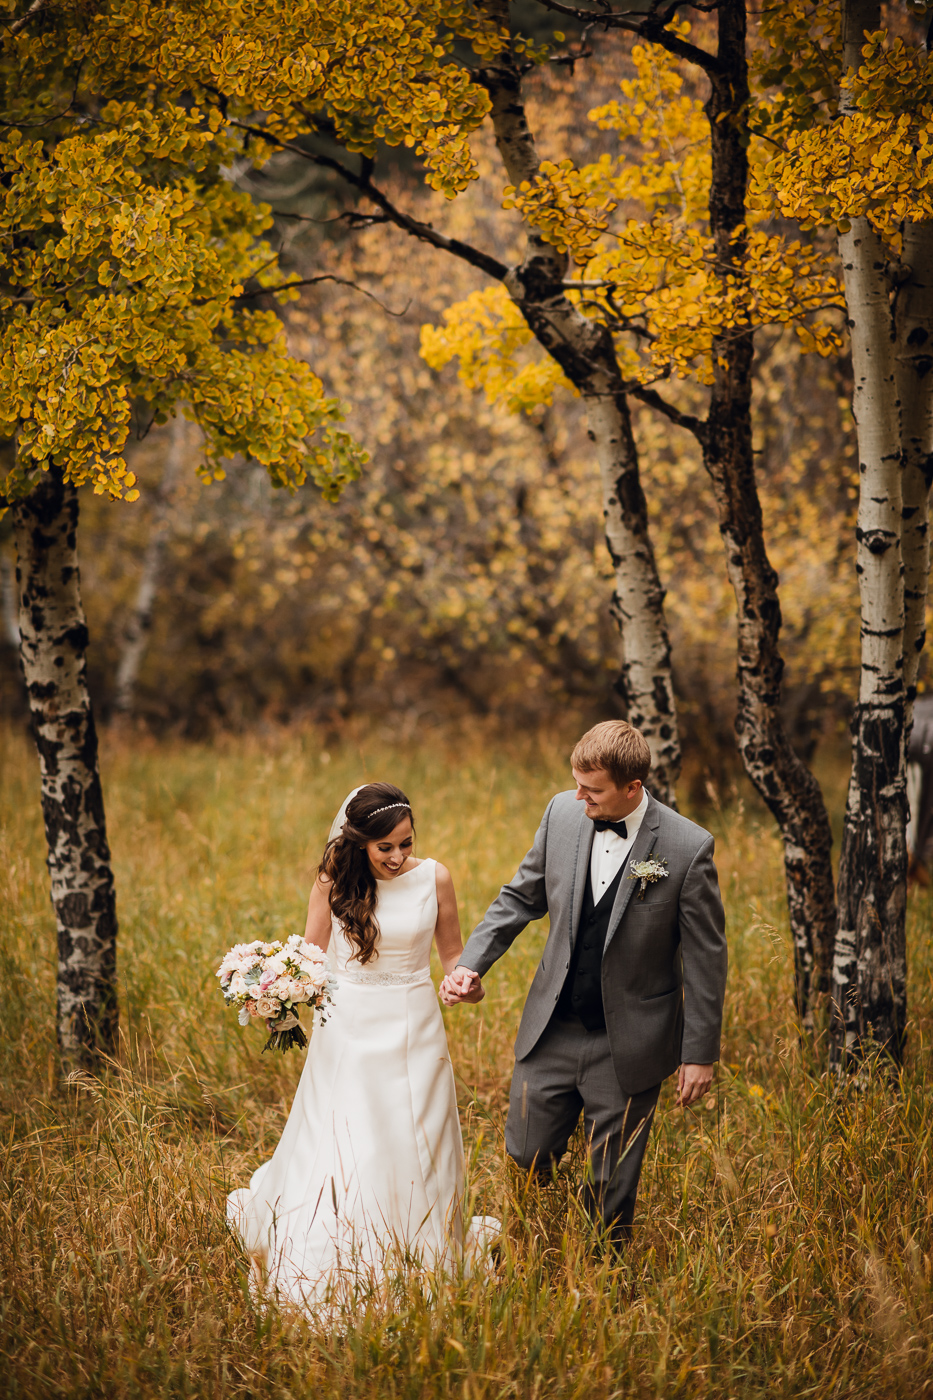 Candice Rawlin Wedding PHOCO Photography Pines Genesee Golden Colorado Fog -16.jpg